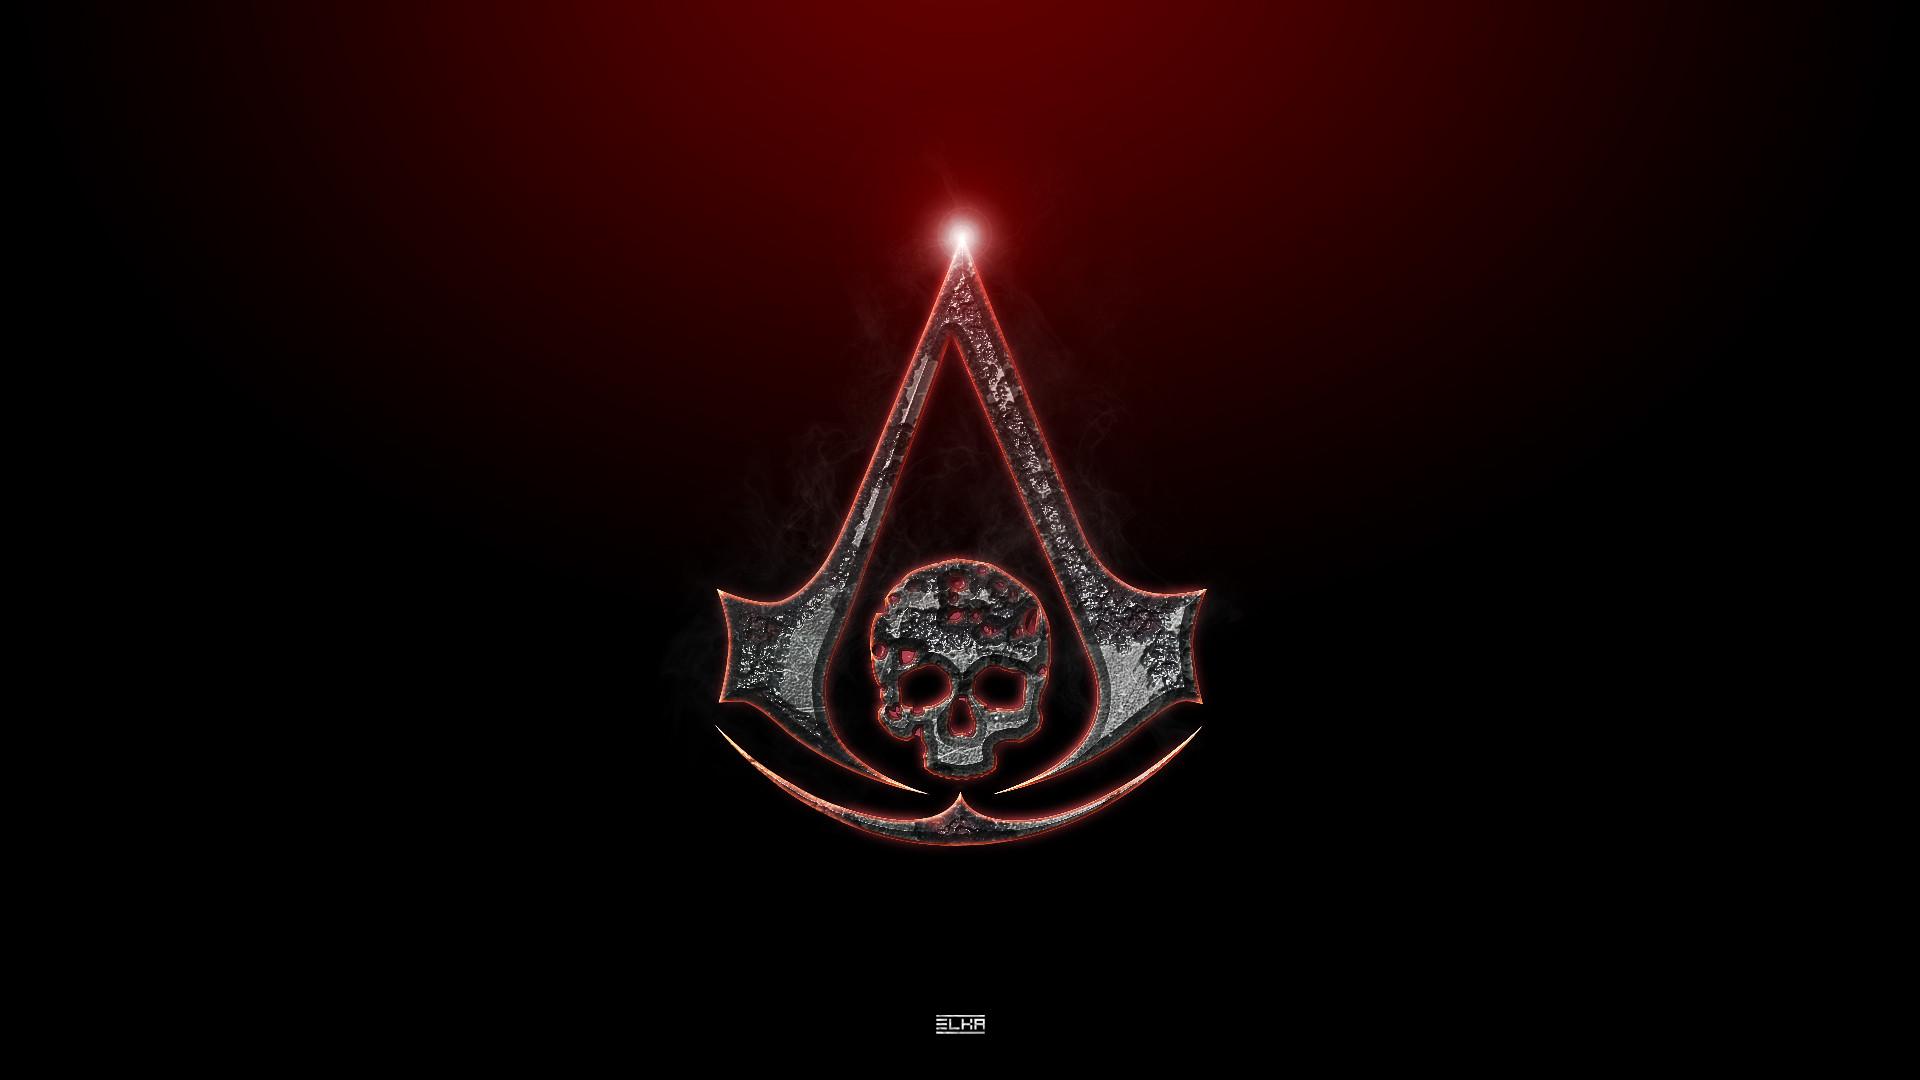 Assassins Creed Brotherhood Wallpapers Group | HD Wallpapers | Pinterest | Assassins  creed and Wallpaper